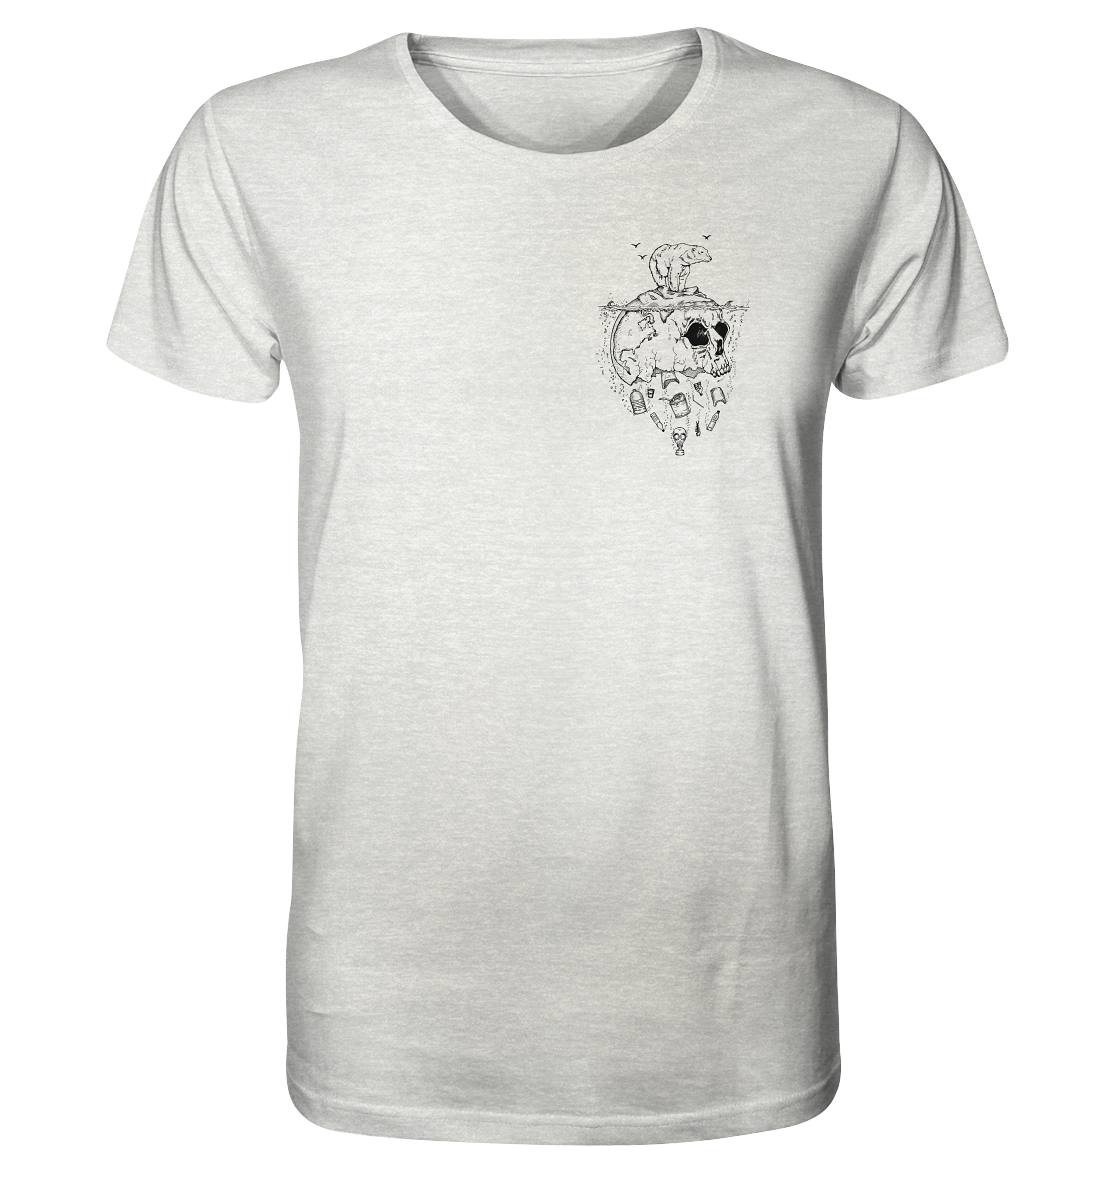 front-organic-shirt-meliert-f2f5f3-1116x-20.png